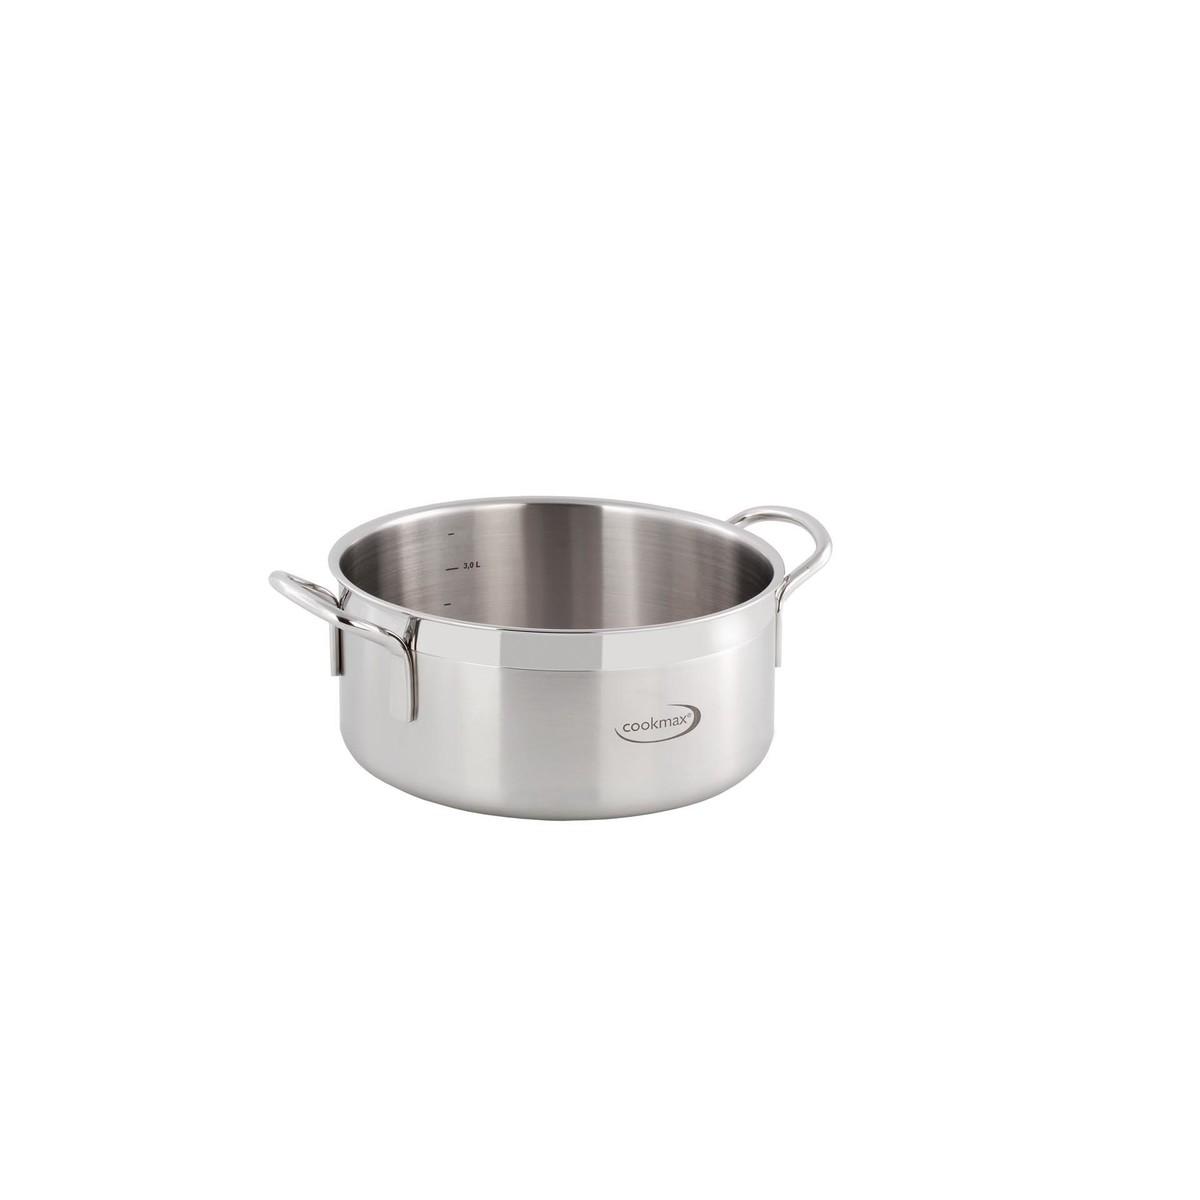 "Bratentopf flach ""Cookmax Gourmet"" Ø 20 cm, H: 9 cm. Inhalt 2,8L"